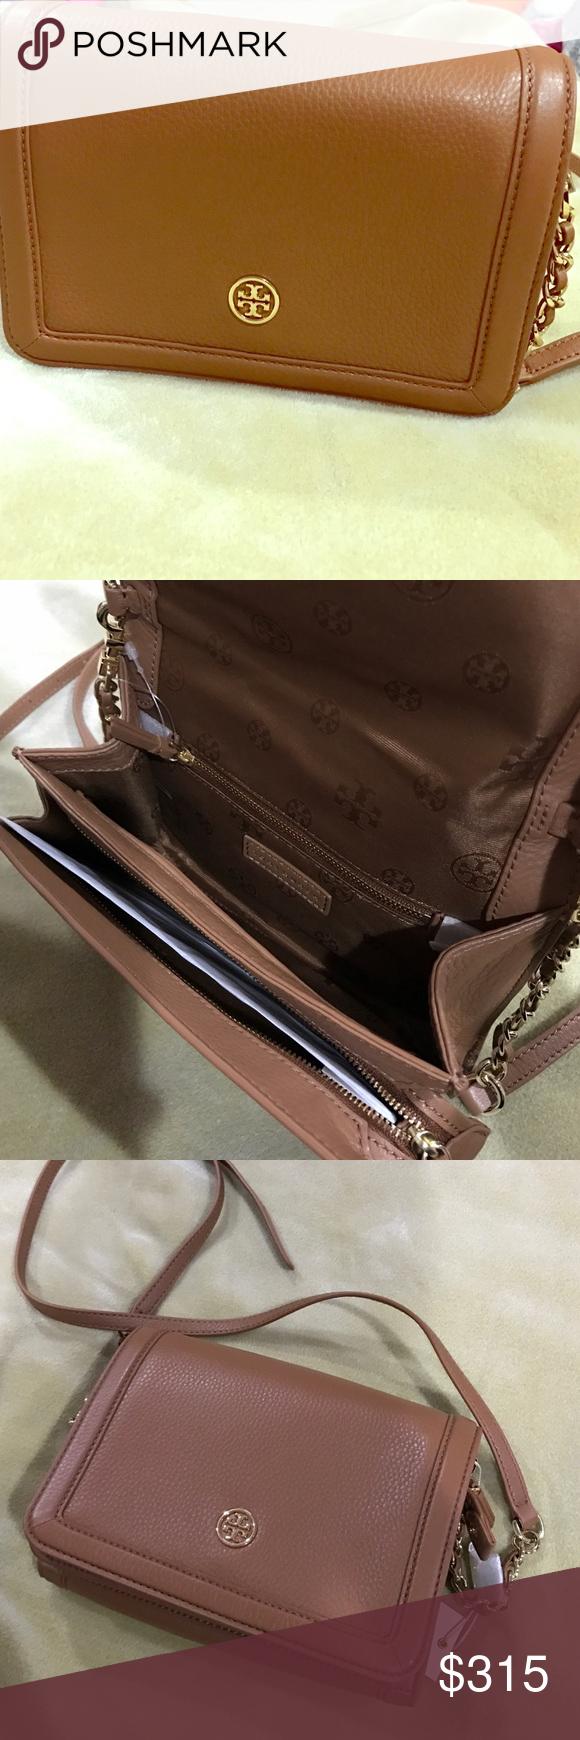 06dd4d0855d Tory burch landon combo cross body bag Flap with nap closure. 1 zipper  pocket under